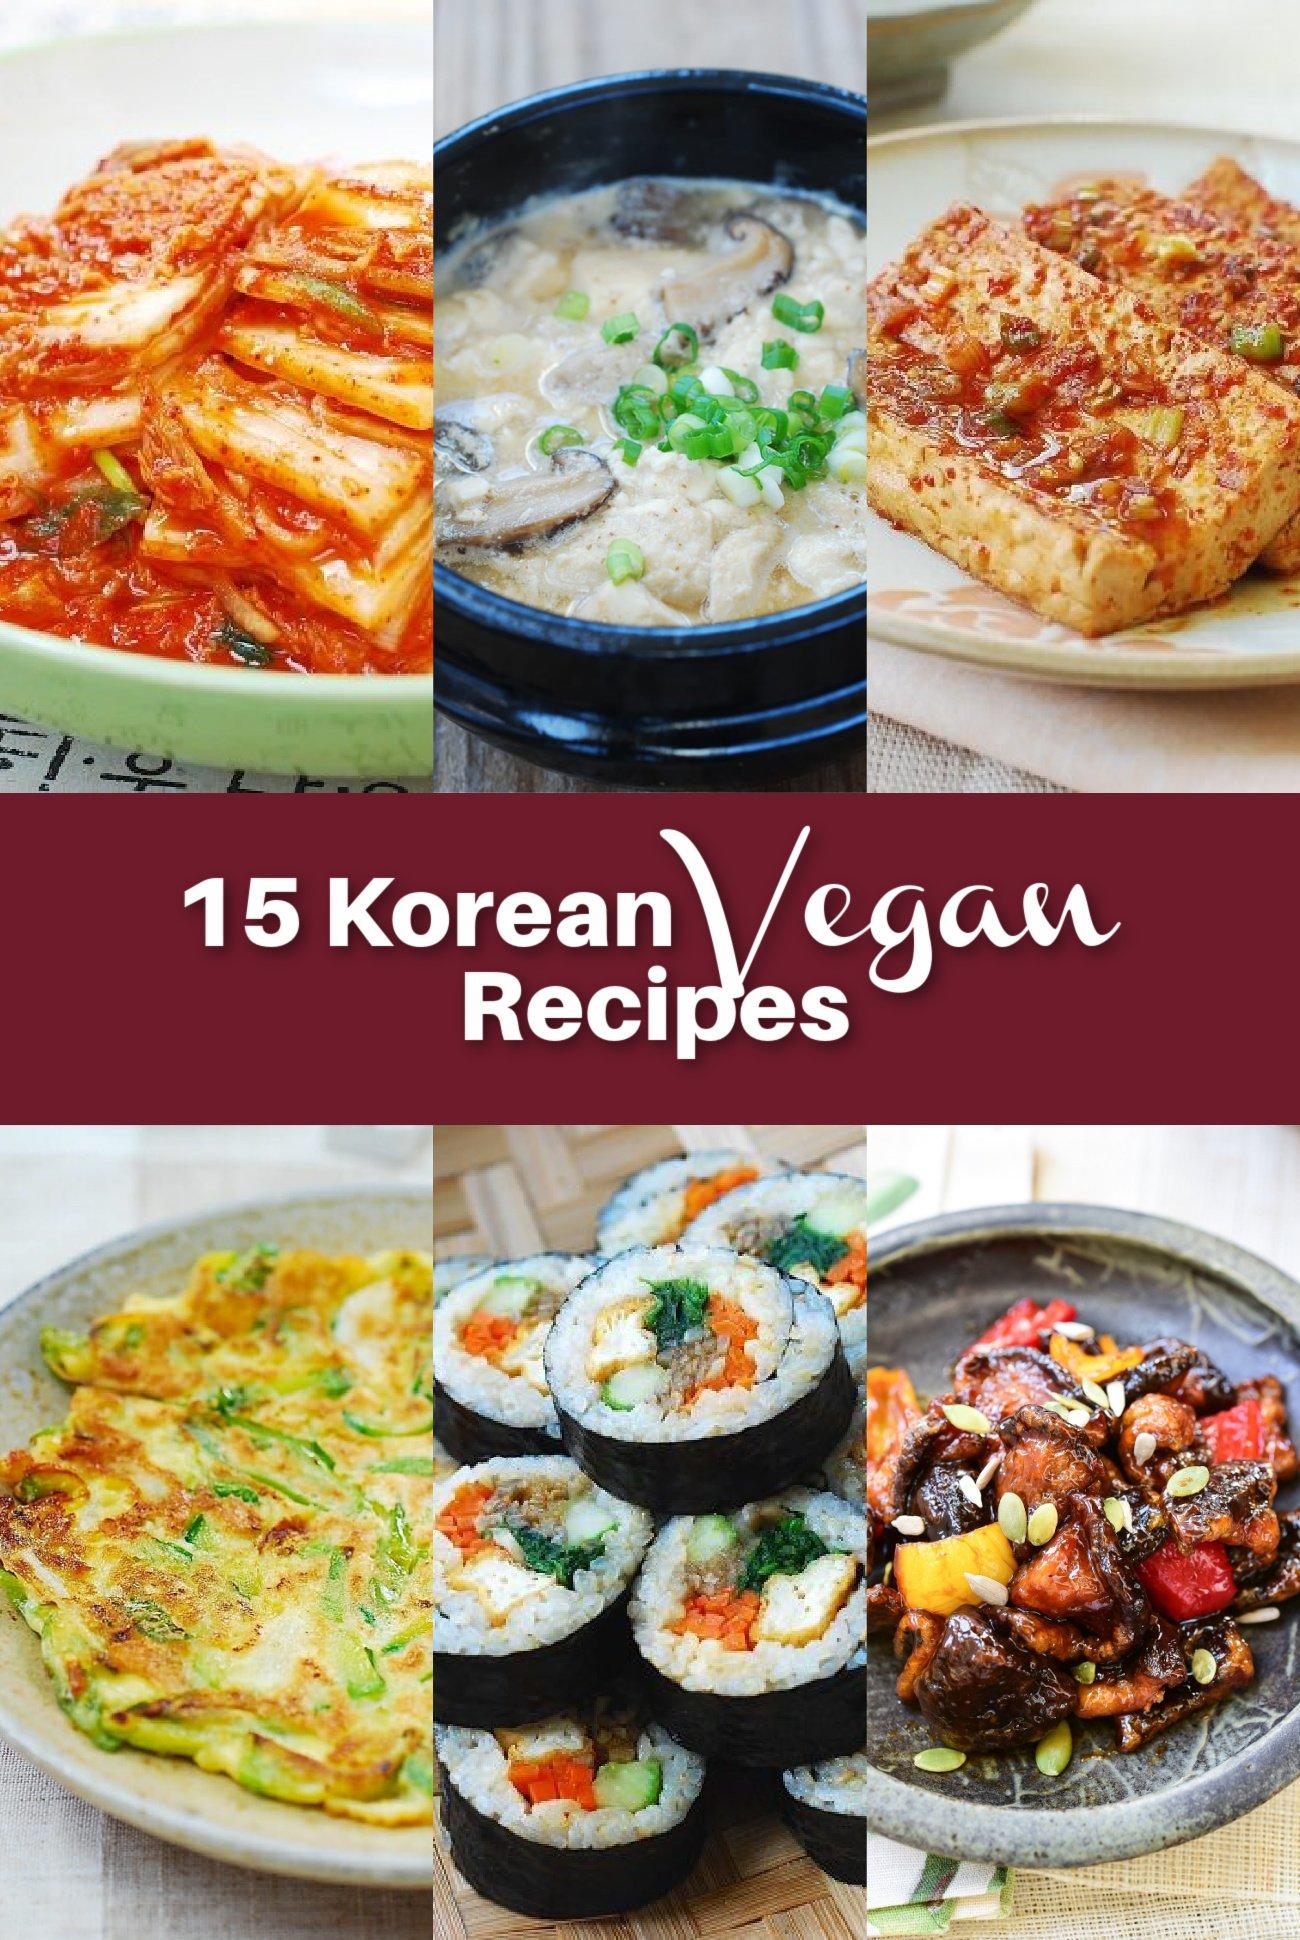 15 Vegan Recipes - 15 Korean Vegan Recipes